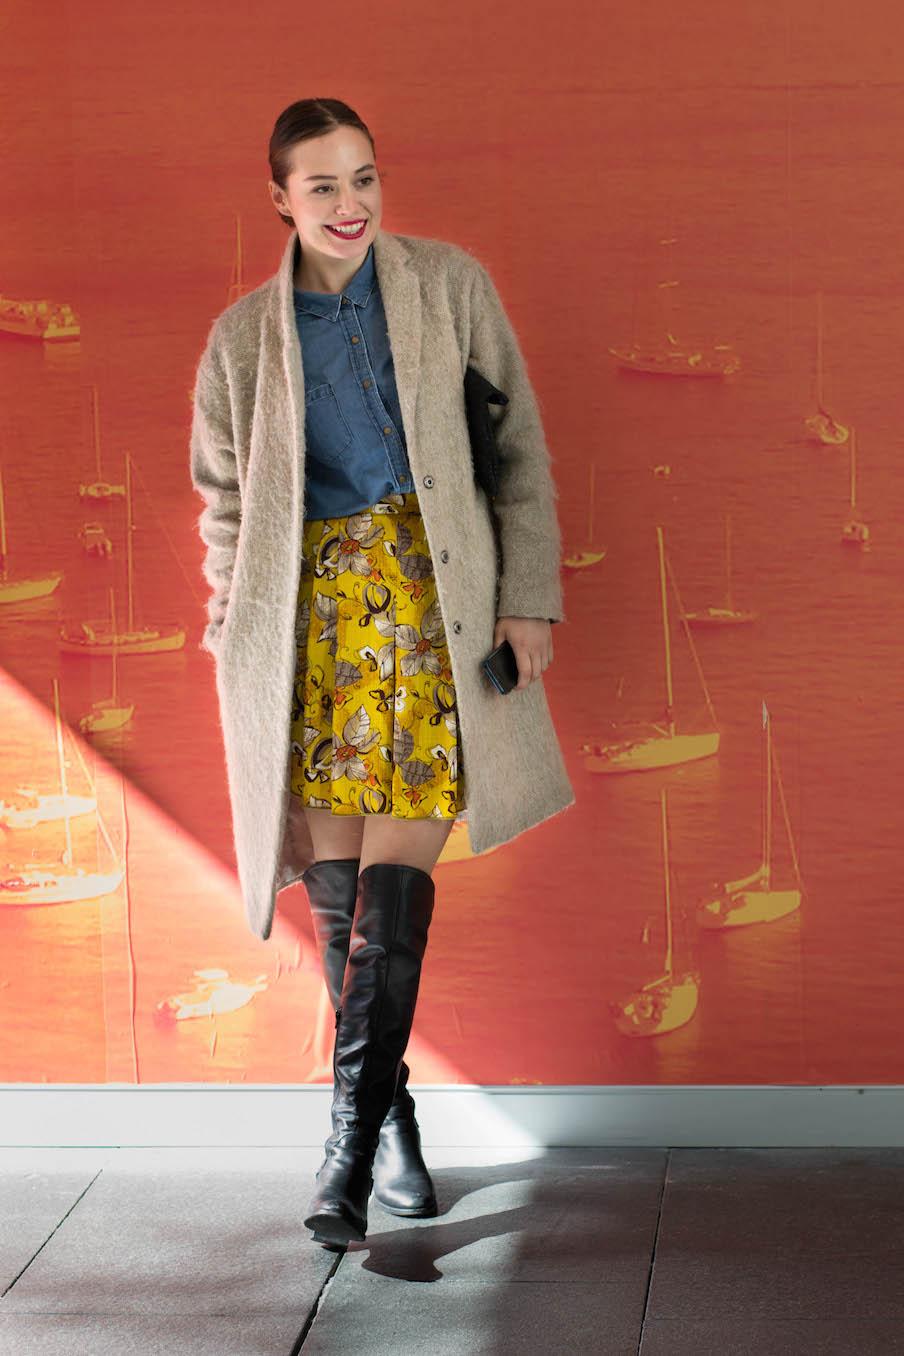 NSW: Natasha Doudkevitch, sales manager, Pitt St. Photo: Alice Scriberras